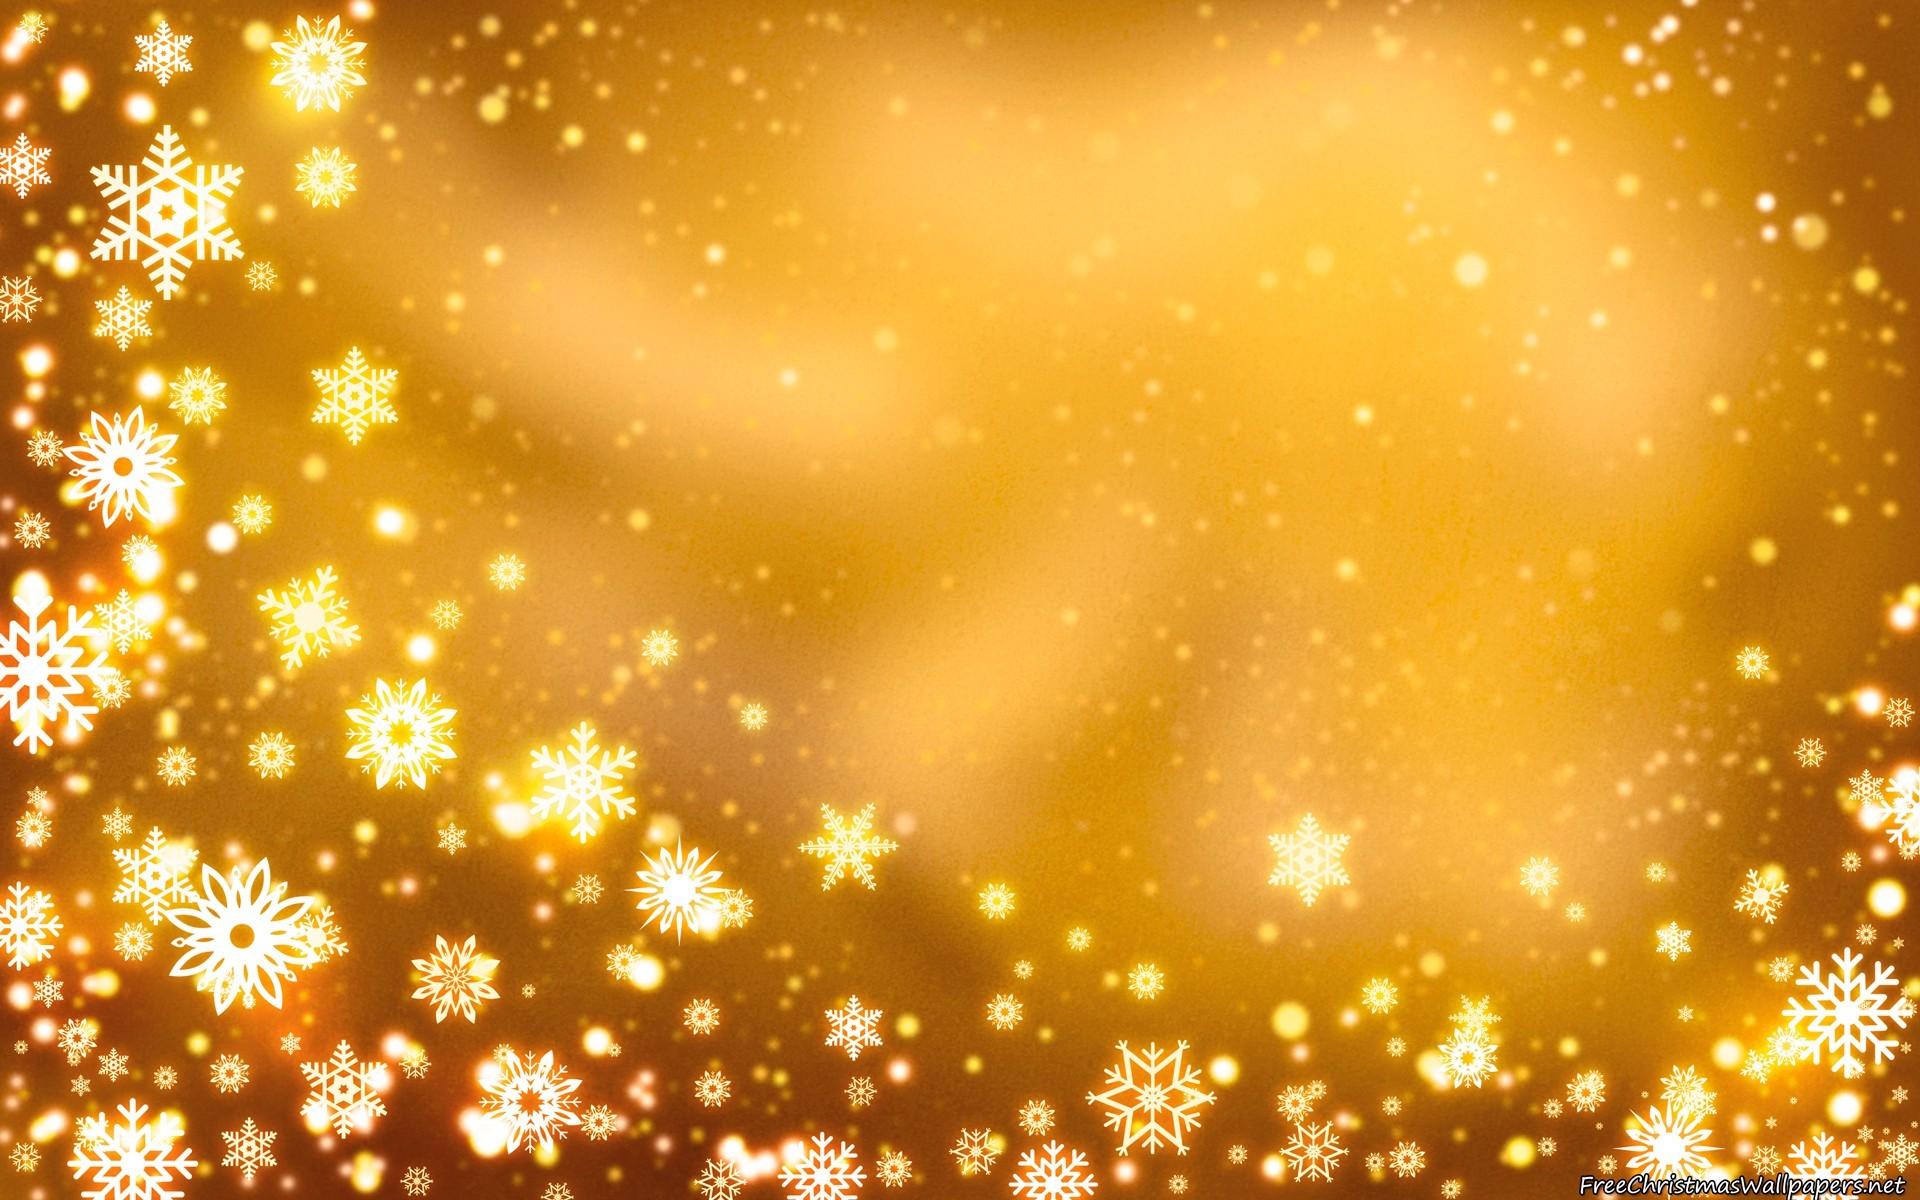 Christmas Wallpaper For Android For Desktop Wallpaper 1920 x 1200 px 692.31  KB snow desktop merry